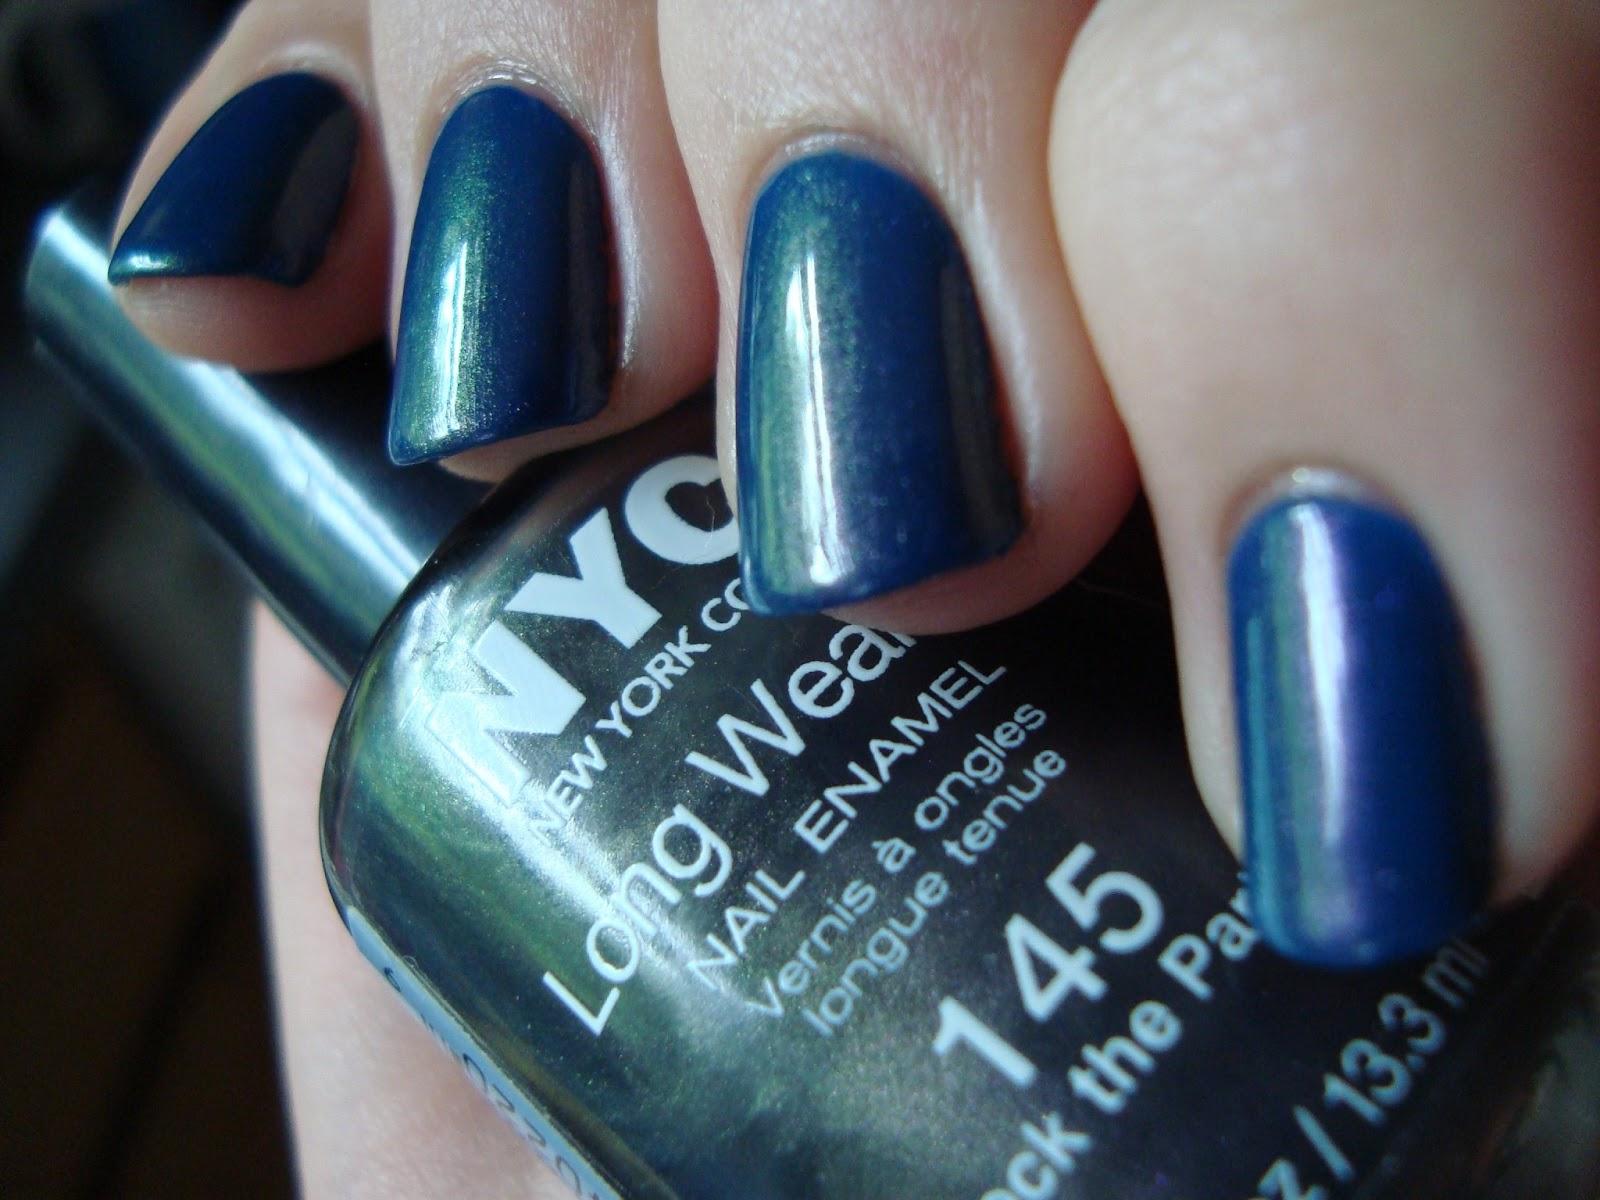 NYC Long Wearing Nail Enamel | Pretty Girl Science